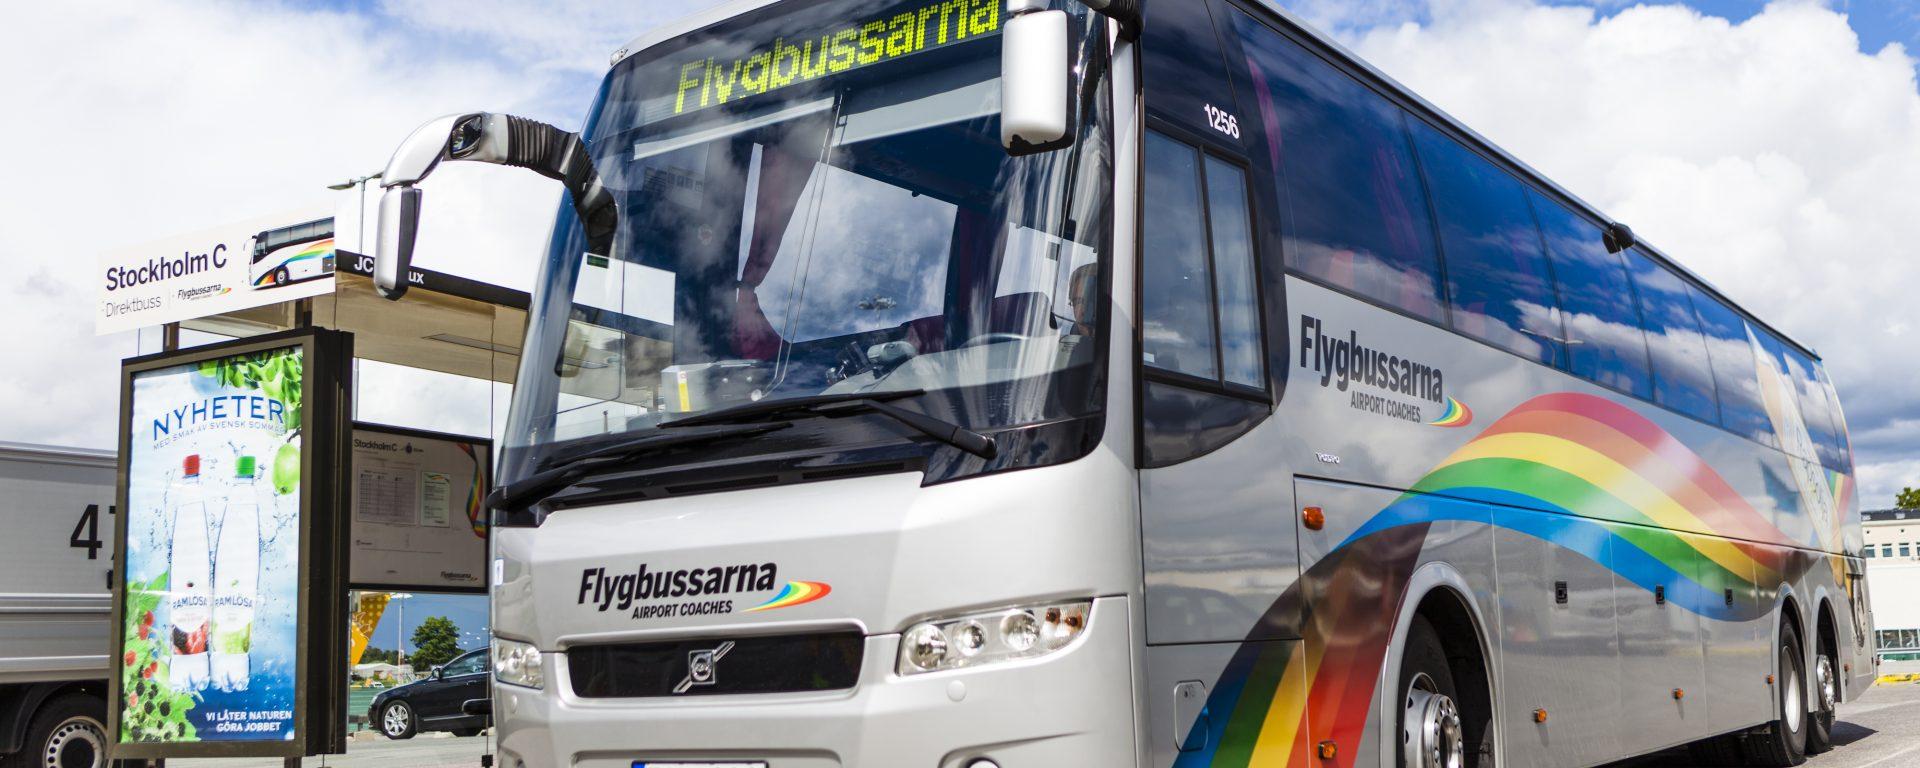 Flygbussarna,bus,transdev,airport,services,2018